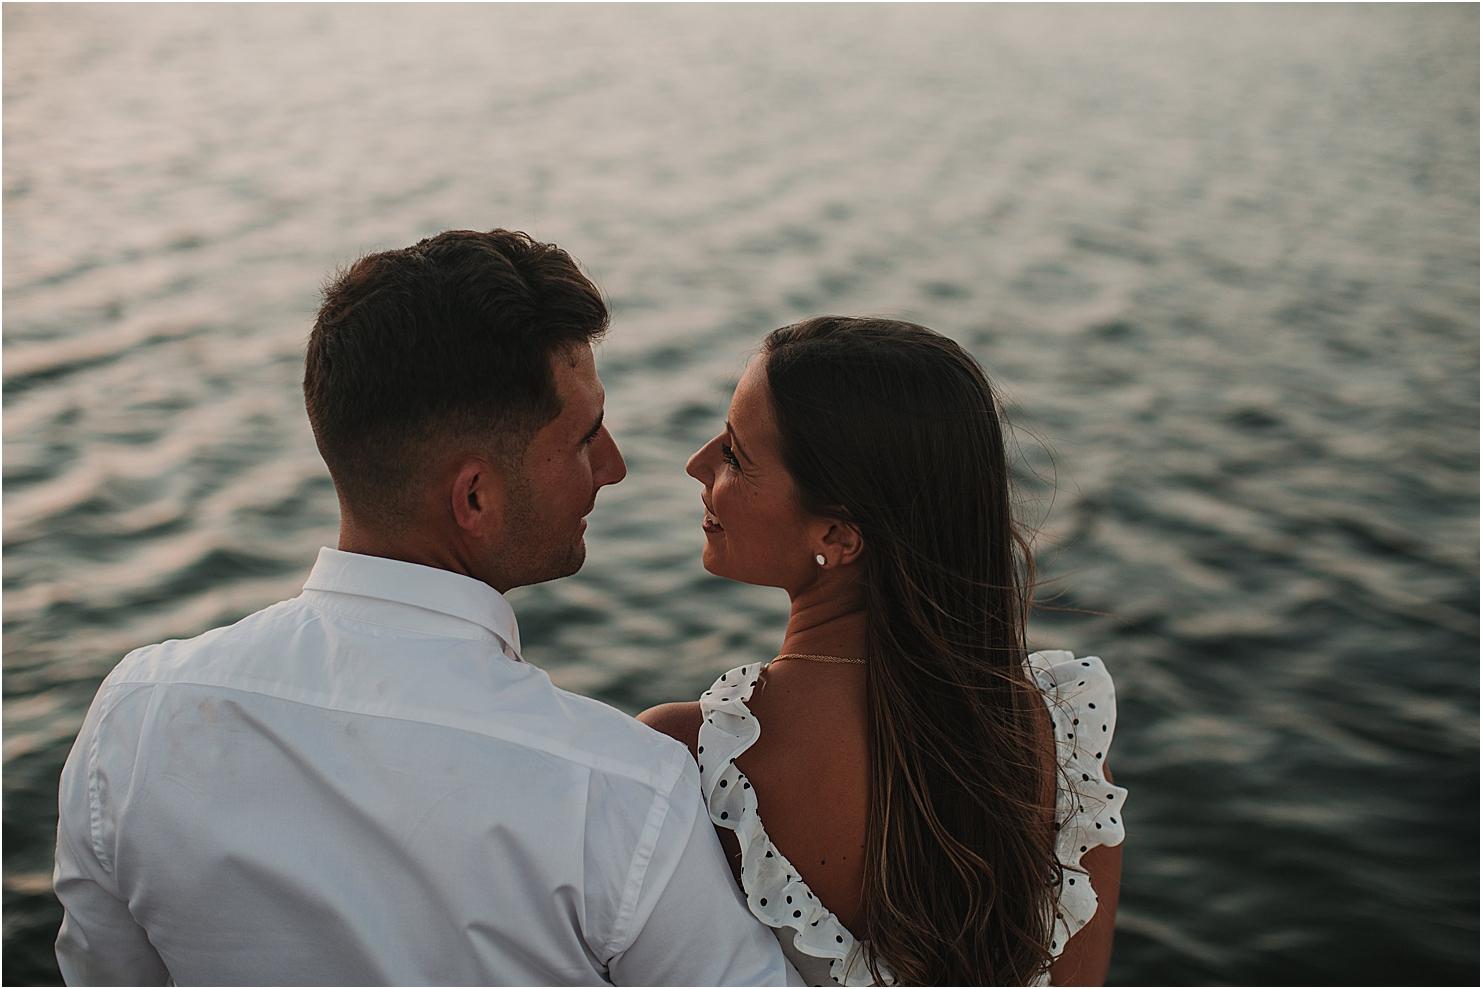 fotografo de boda en tarragona -4.jpg